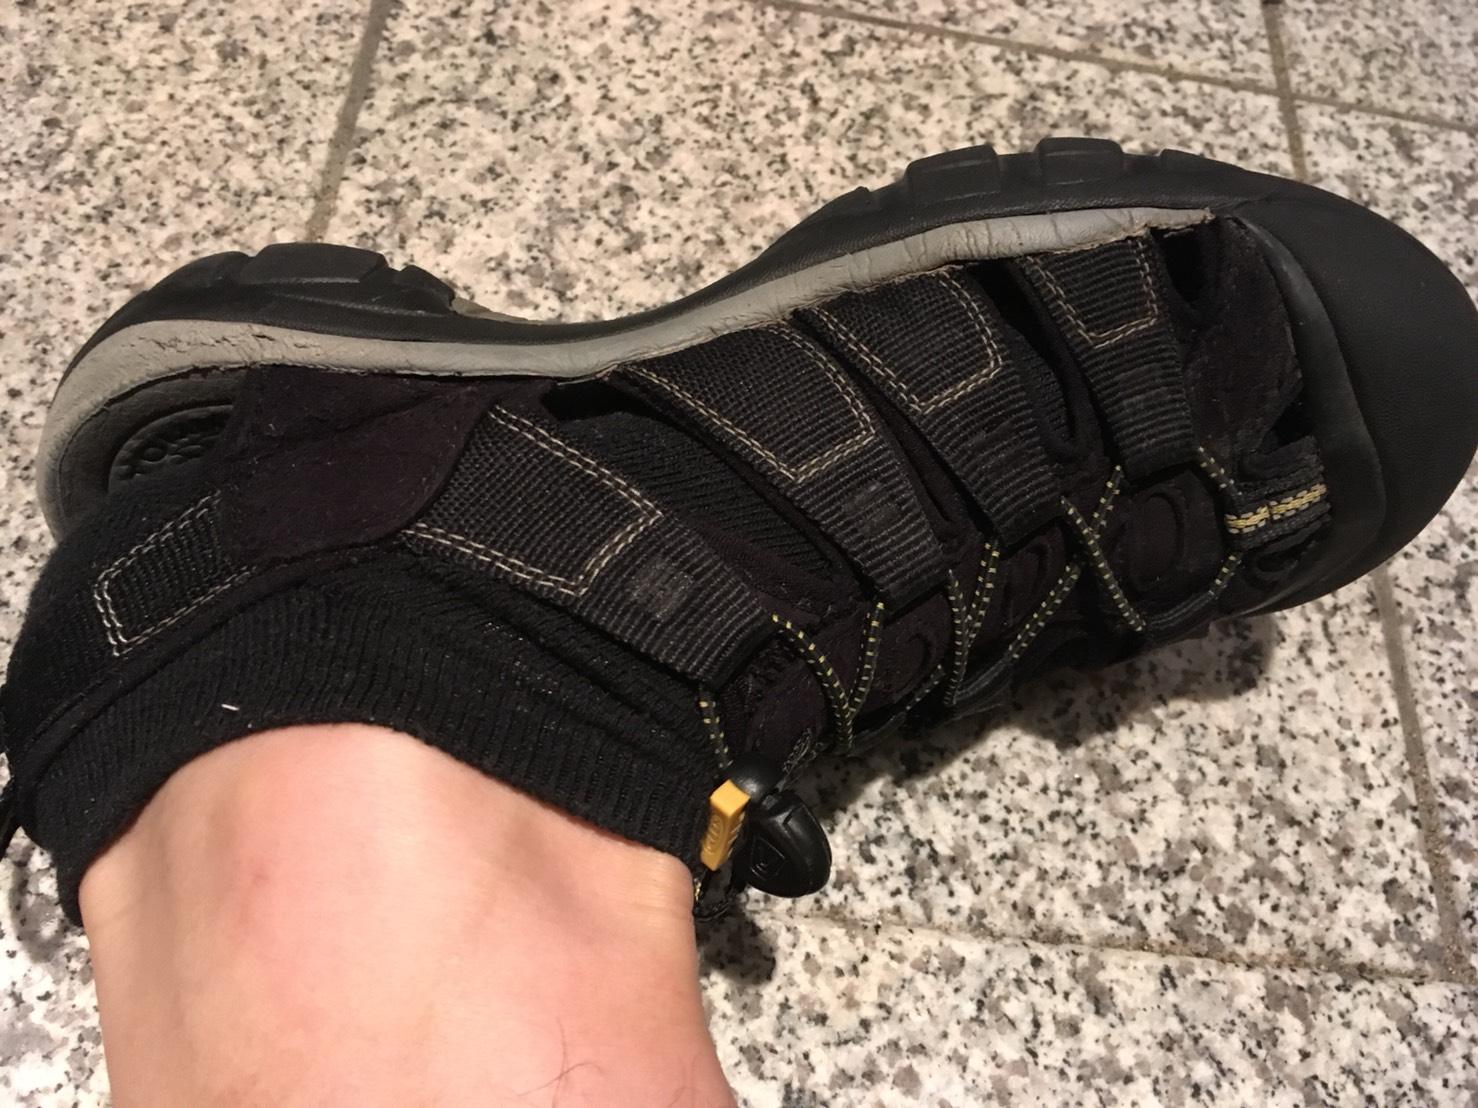 KEEN ニューポートH2 靴下で履いた状態